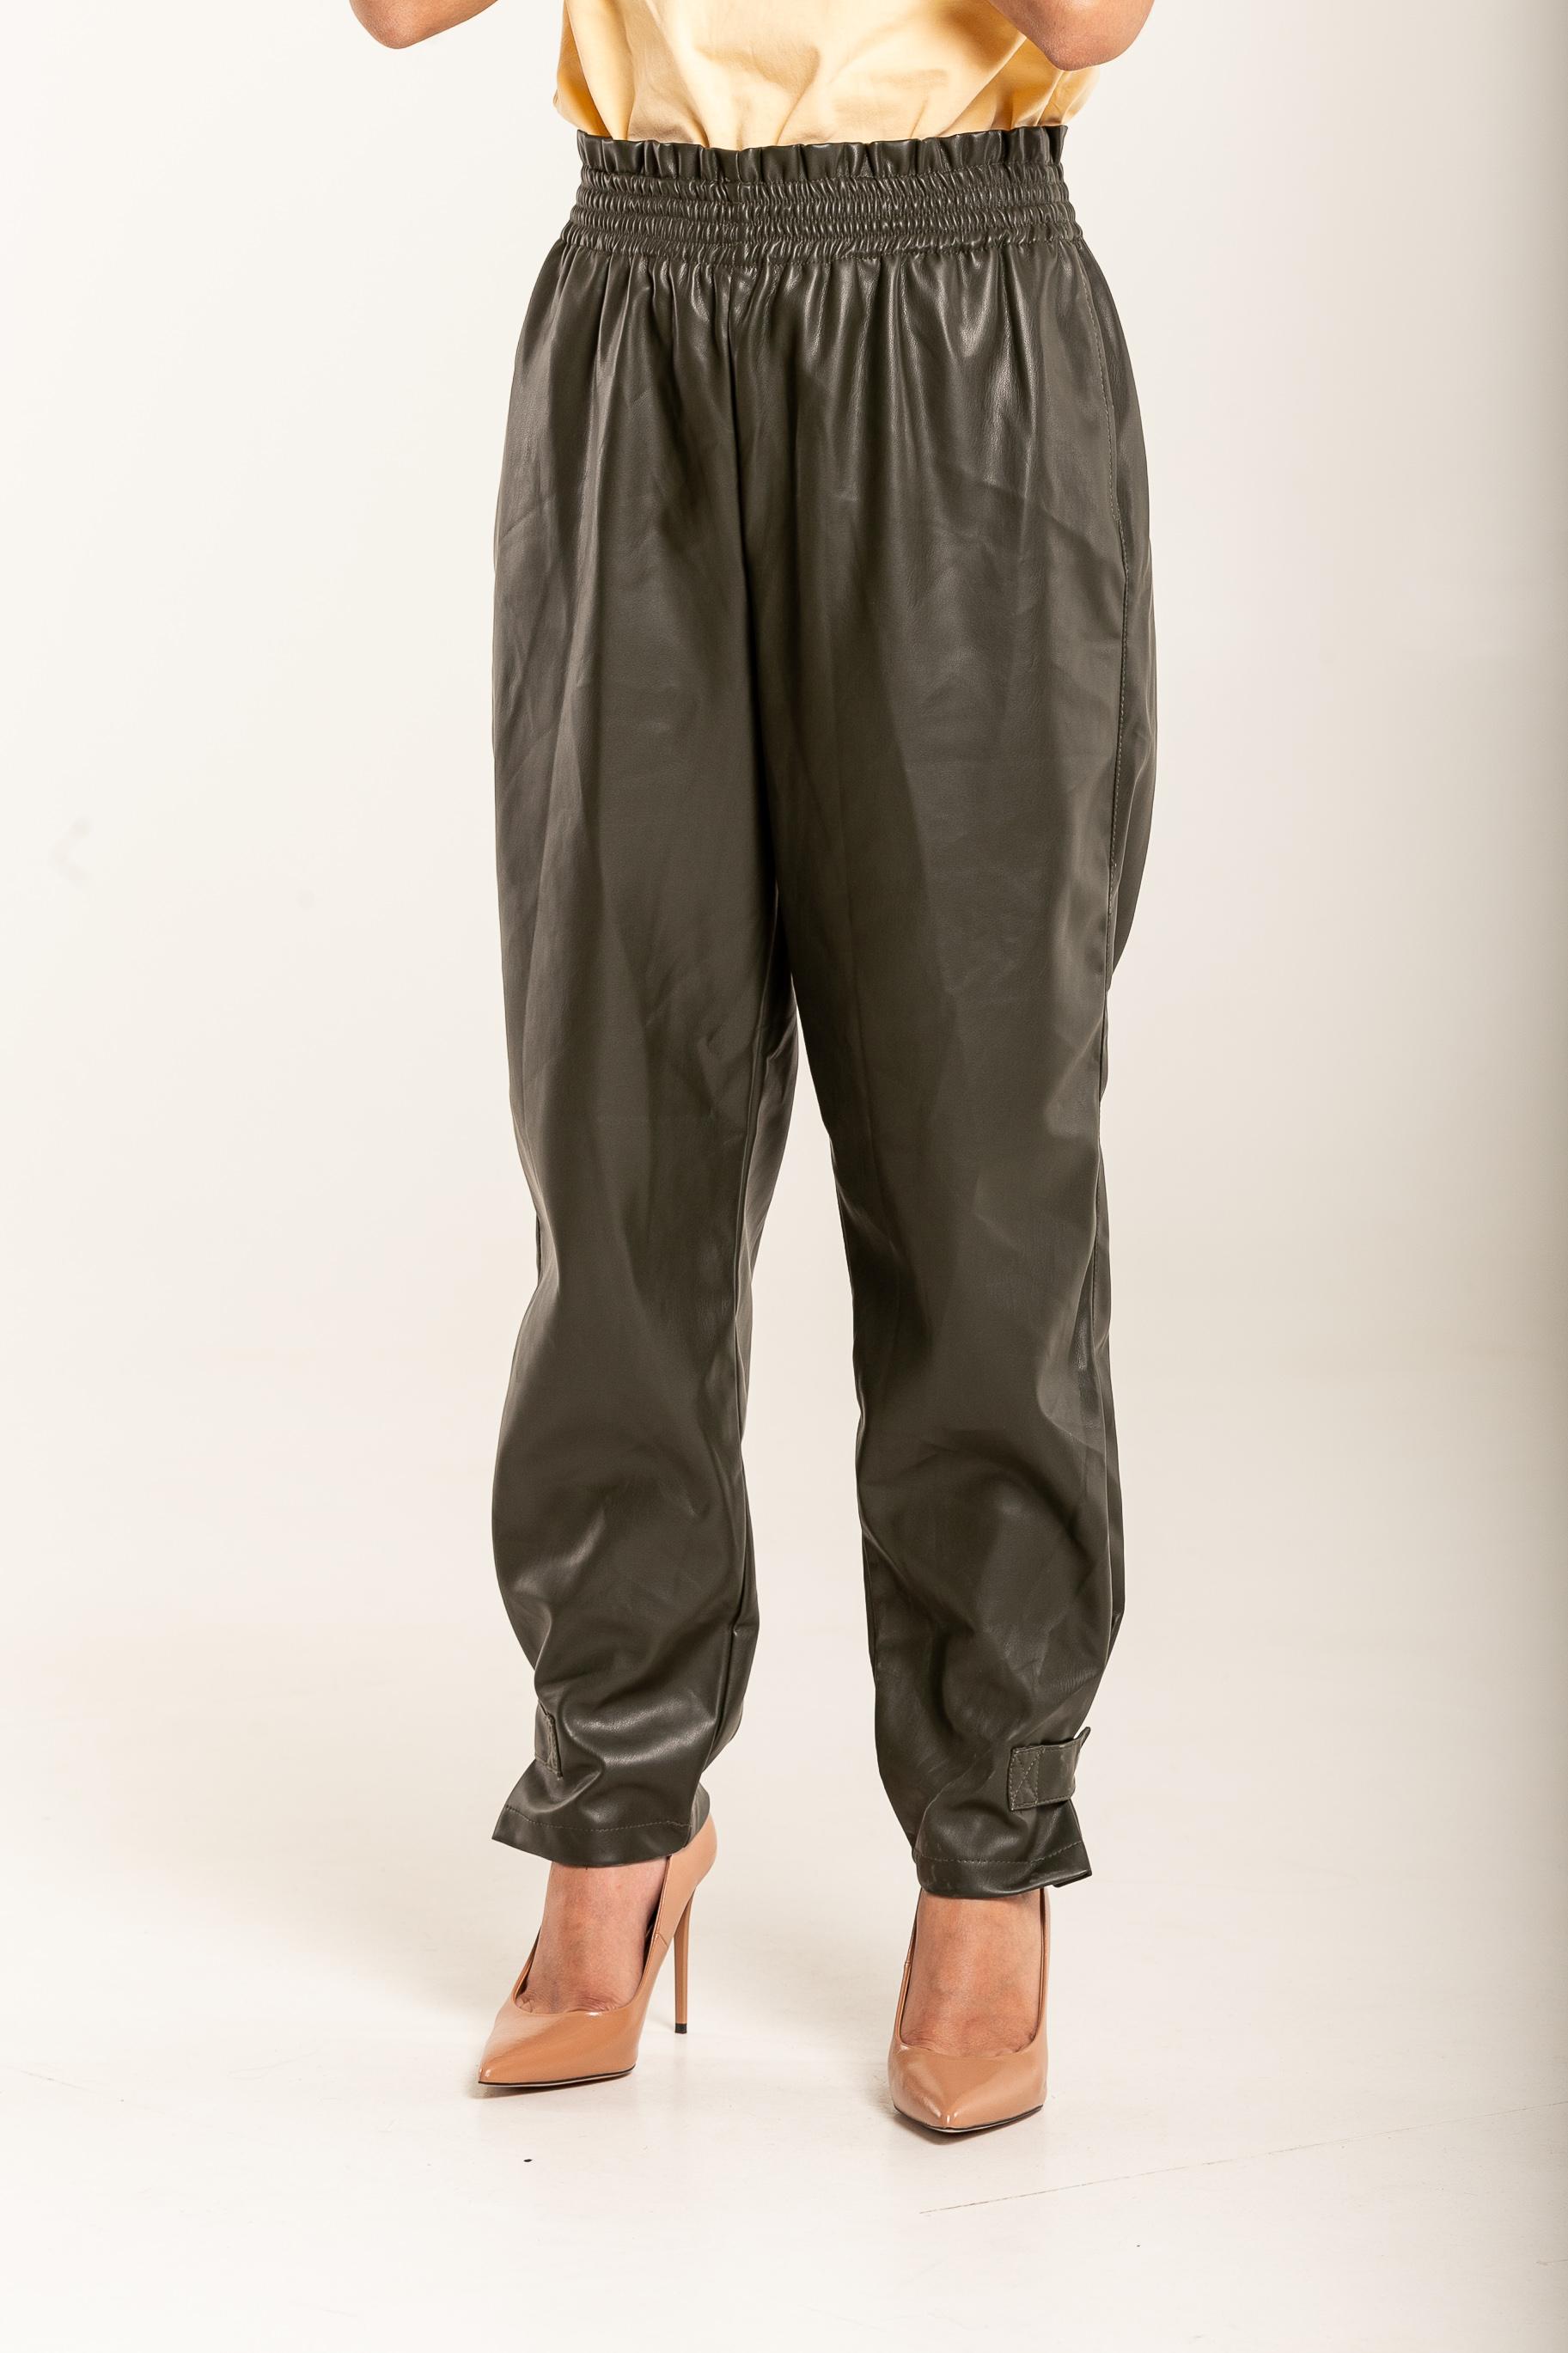 Pantaloni ONLY Casual (3334) photo